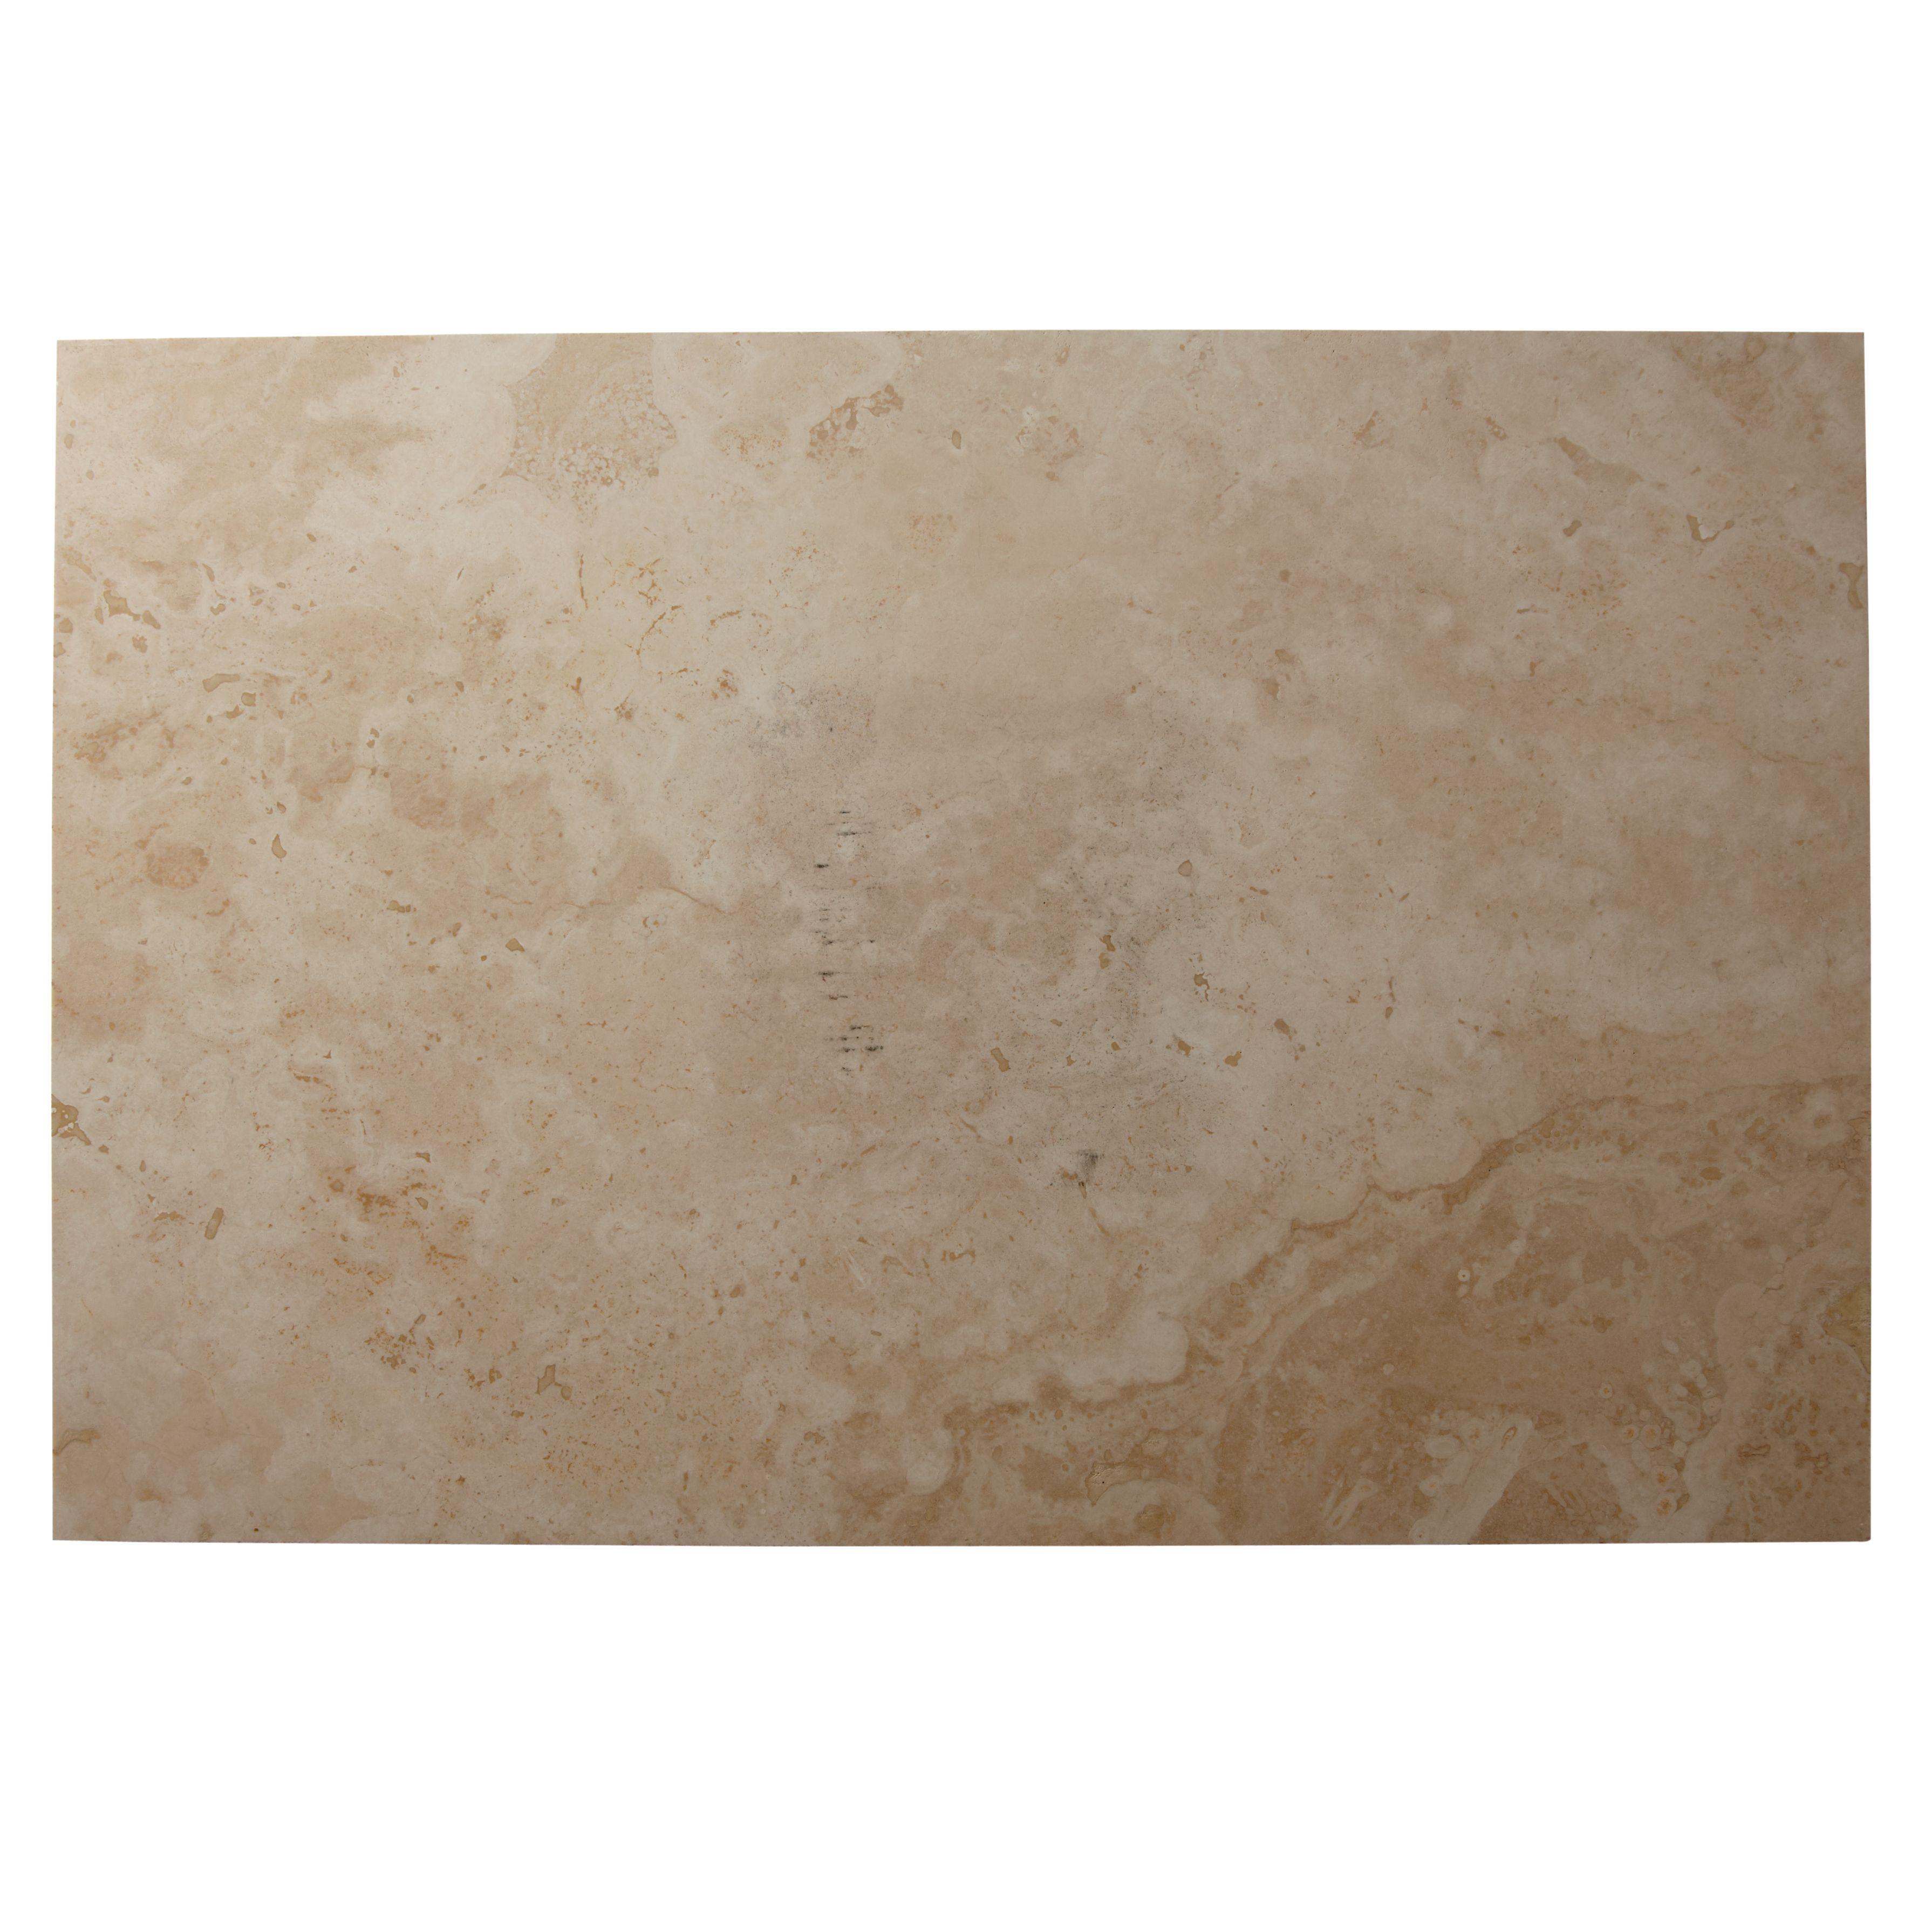 Tumbled Light Beige Stone Effect Travertine Floor Tile, Pack Of 2, (l)610mm (w)406mm